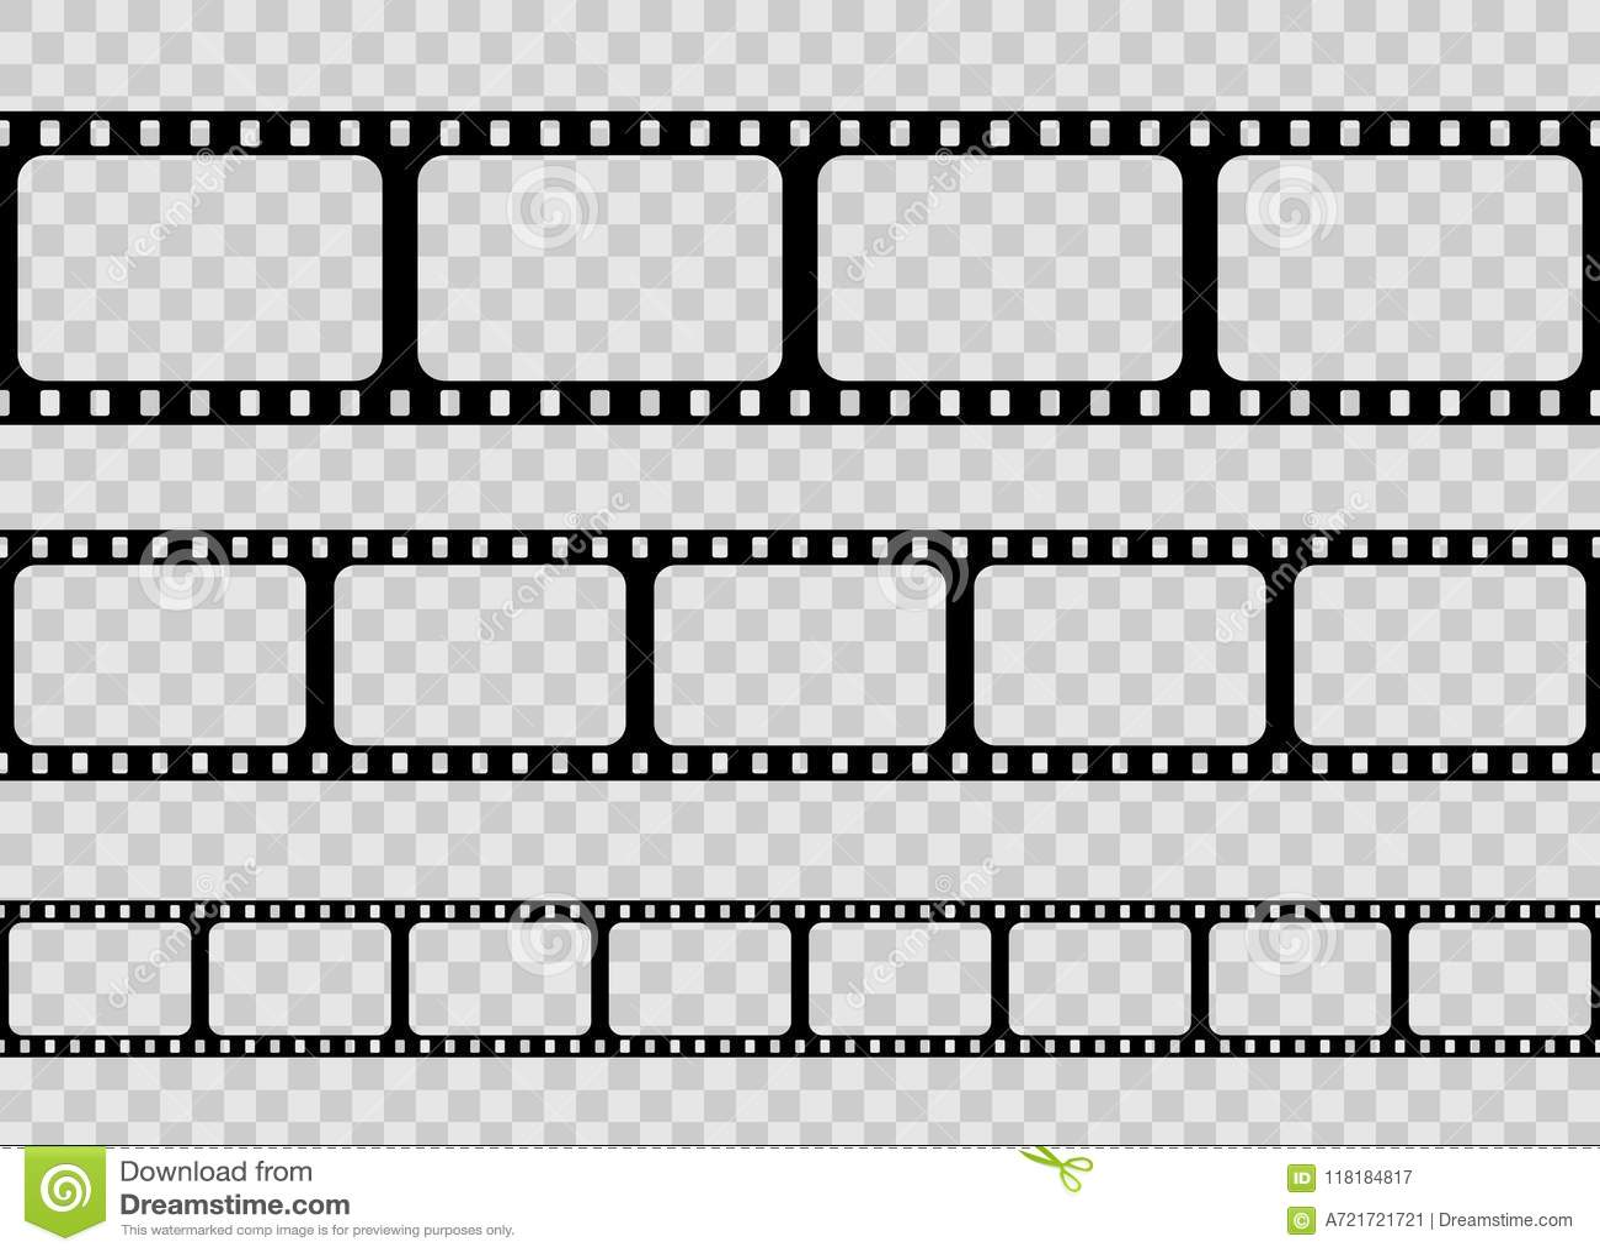 Film strip art